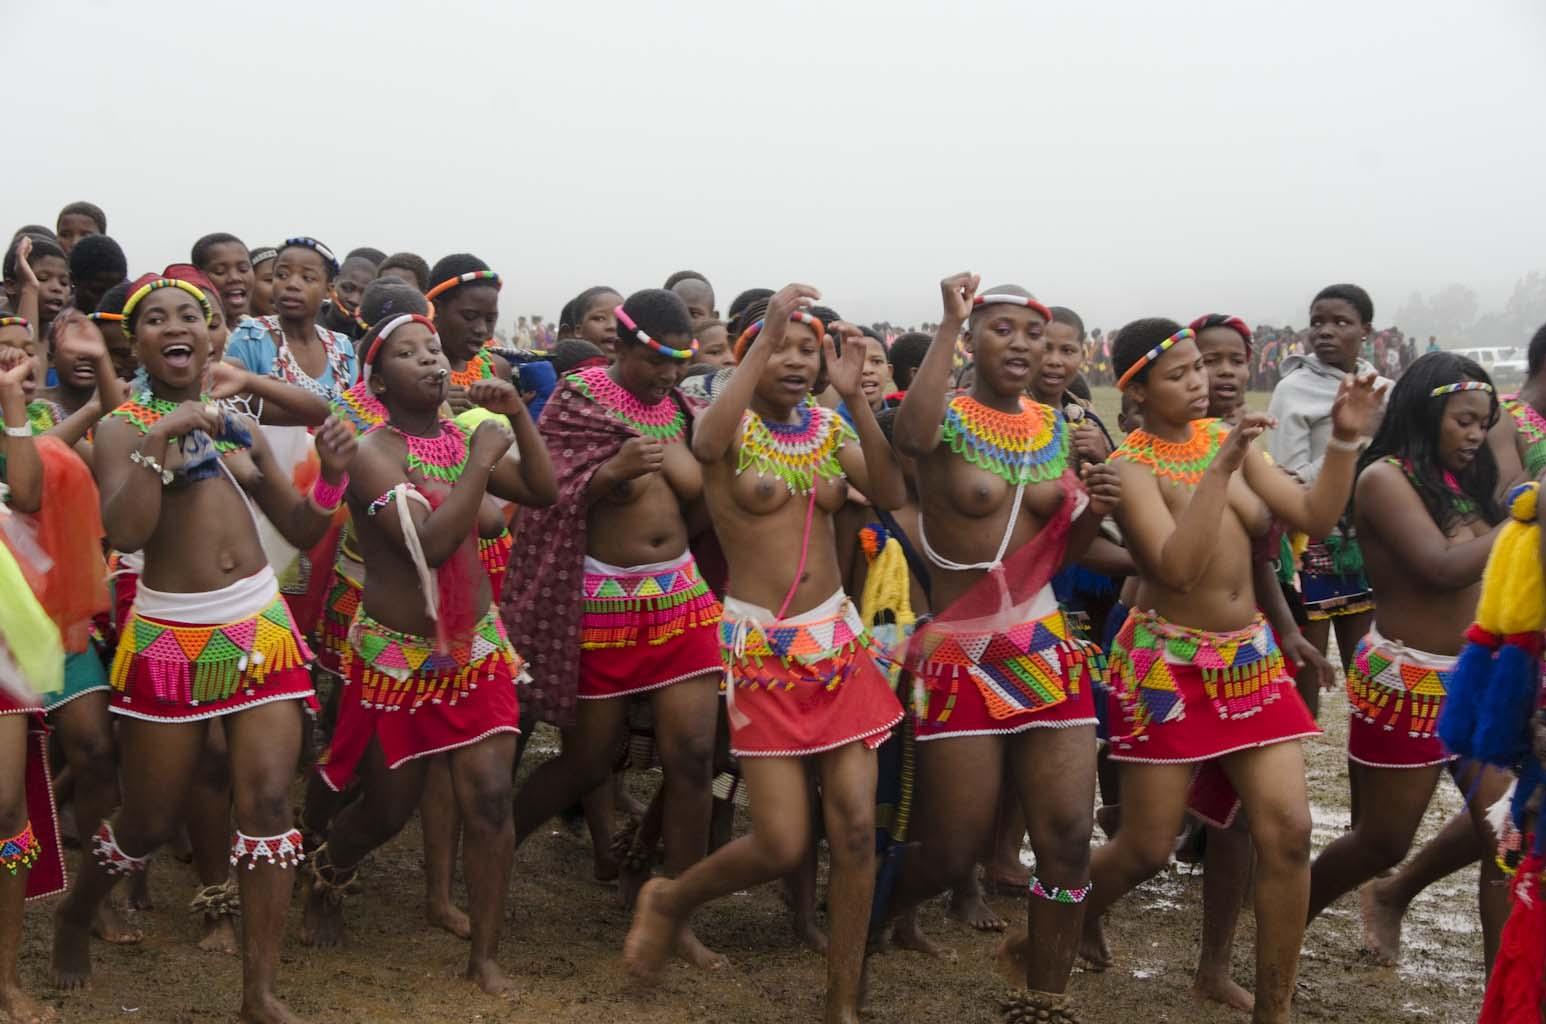 swaziland girls dancing naked